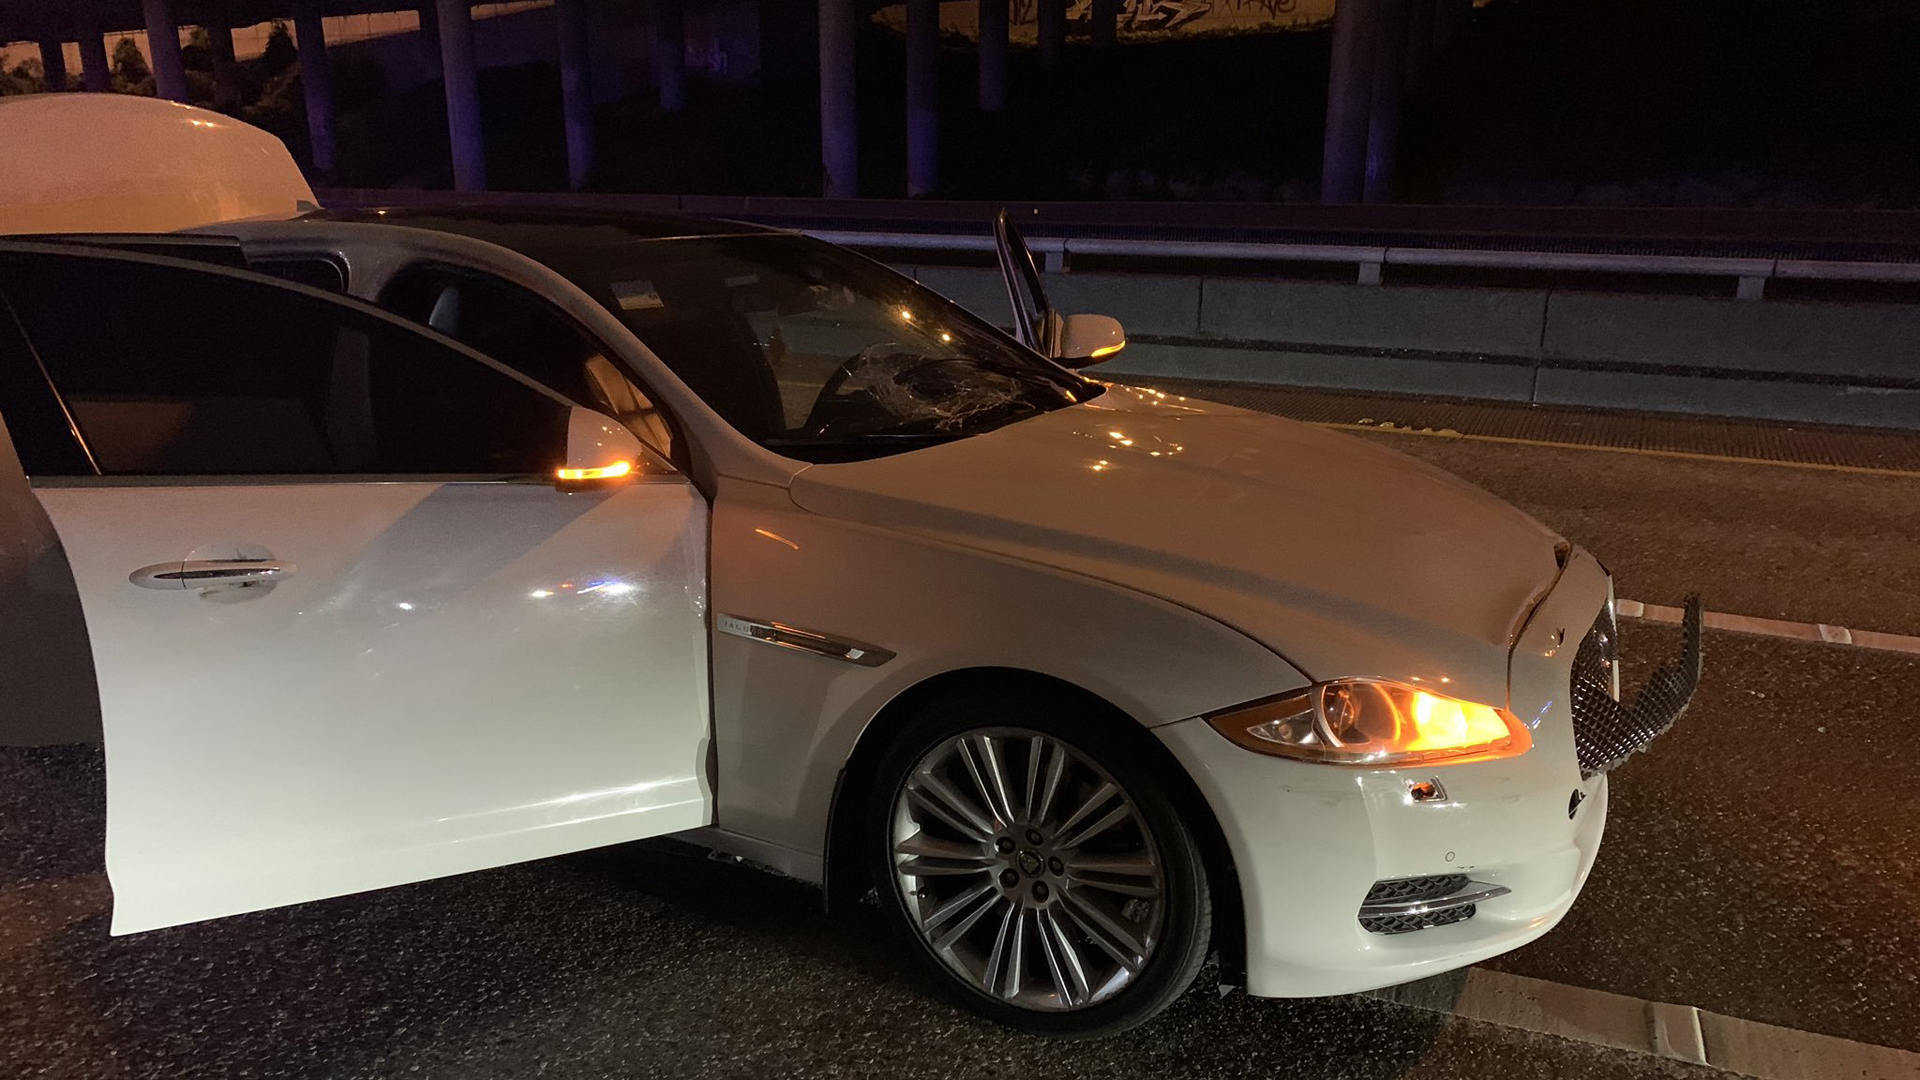 Auto atropella a 2 mujeres en autopista bloqueada — Seattle